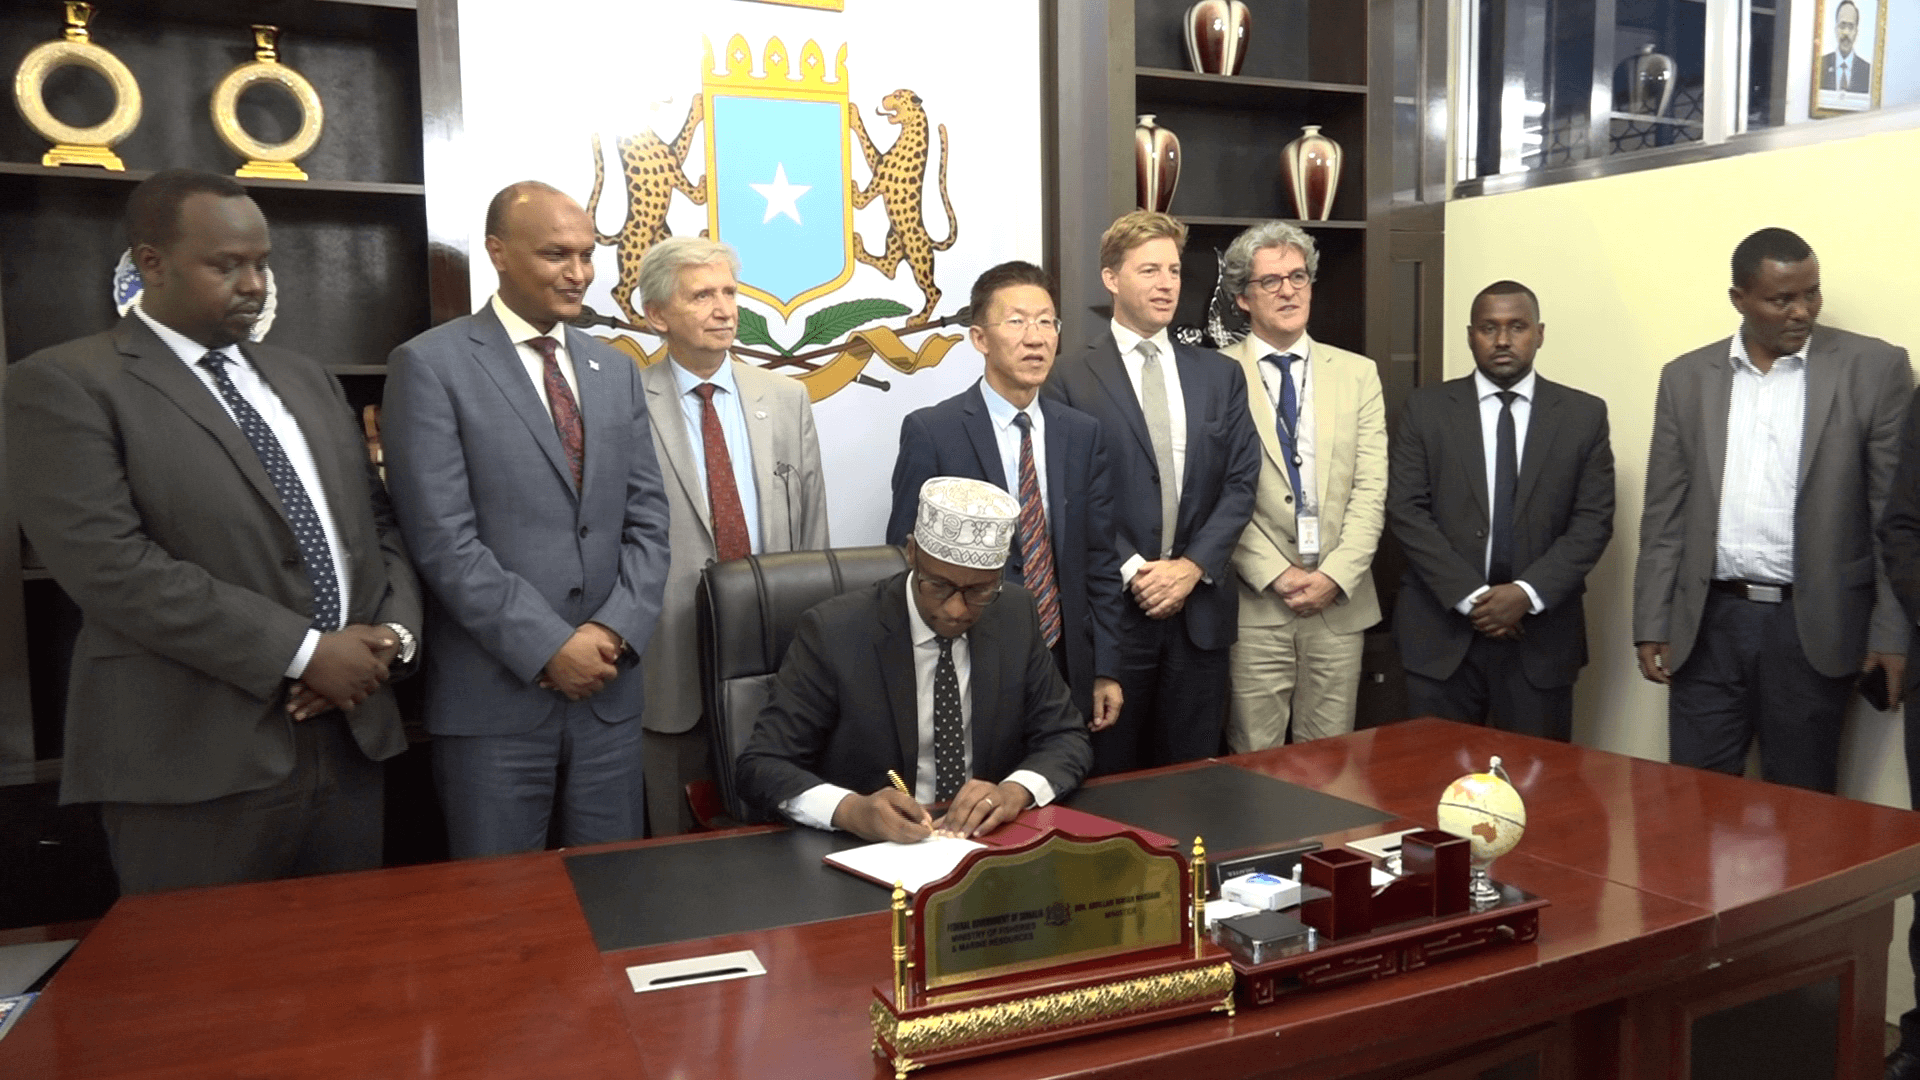 Photo: Somalia Launches Singing of Offshore Tuna Licenses